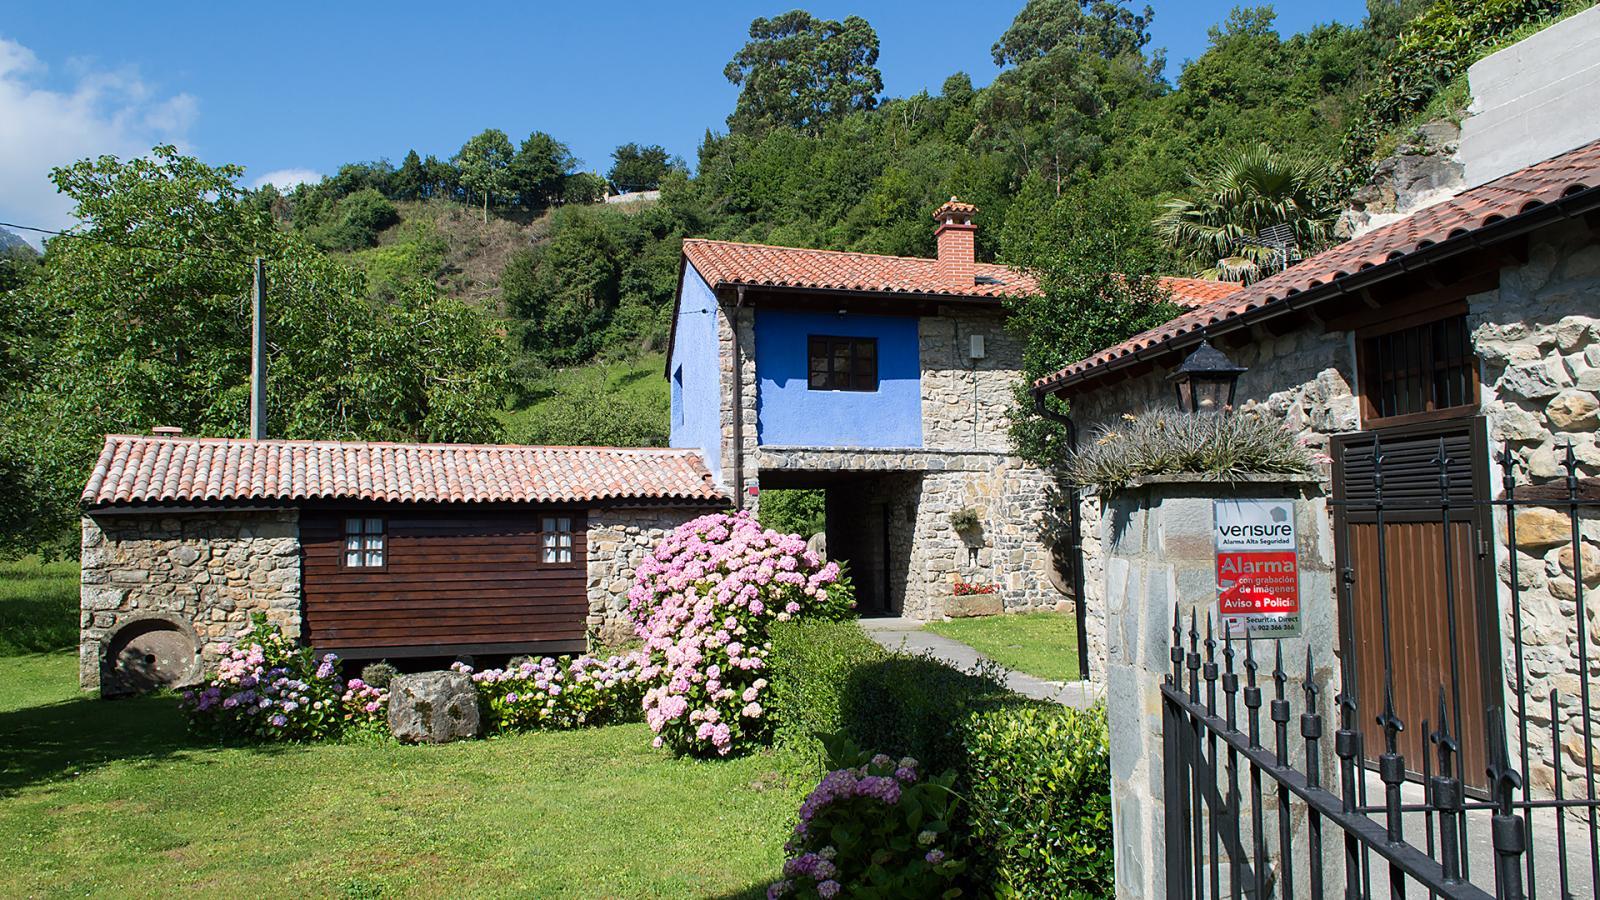 Fotos de el molin de sotu casa rural en colunga asturias - Casa rural asturias mascotas ...